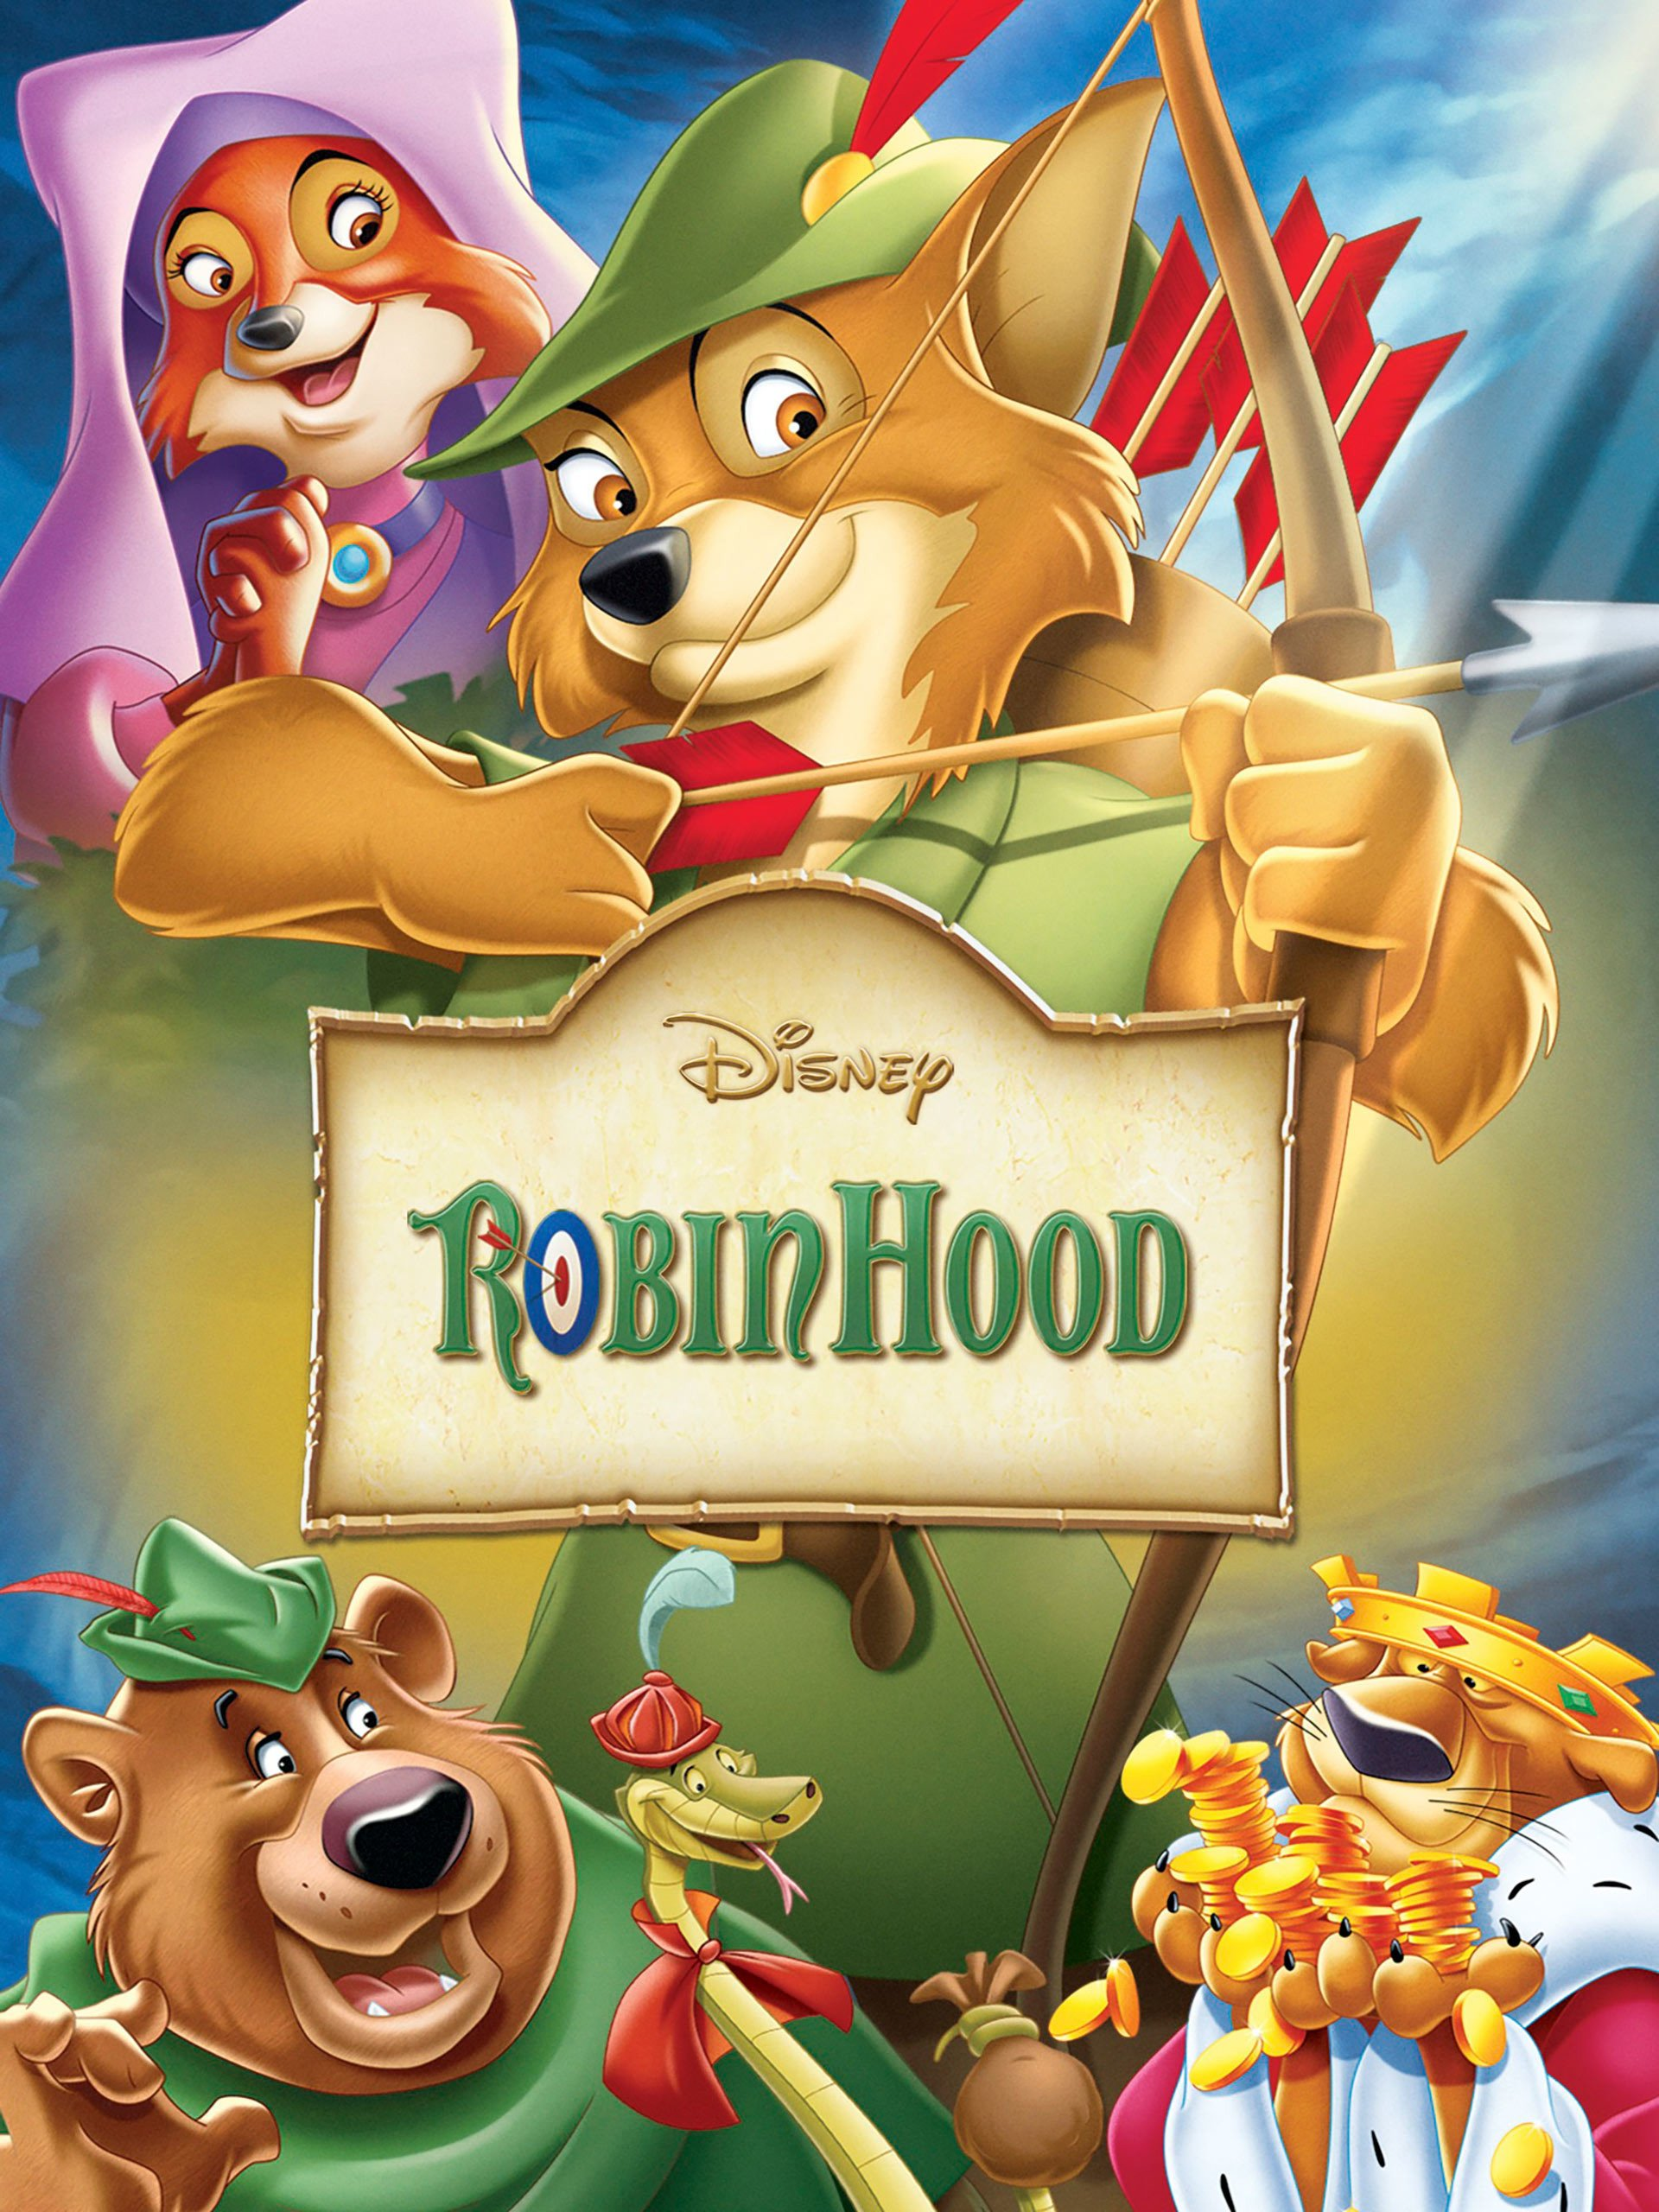 Disney Are Buddies Porn - Amazon.com: Robin Hood: Roger Miller, Phil Harris, Brian ...